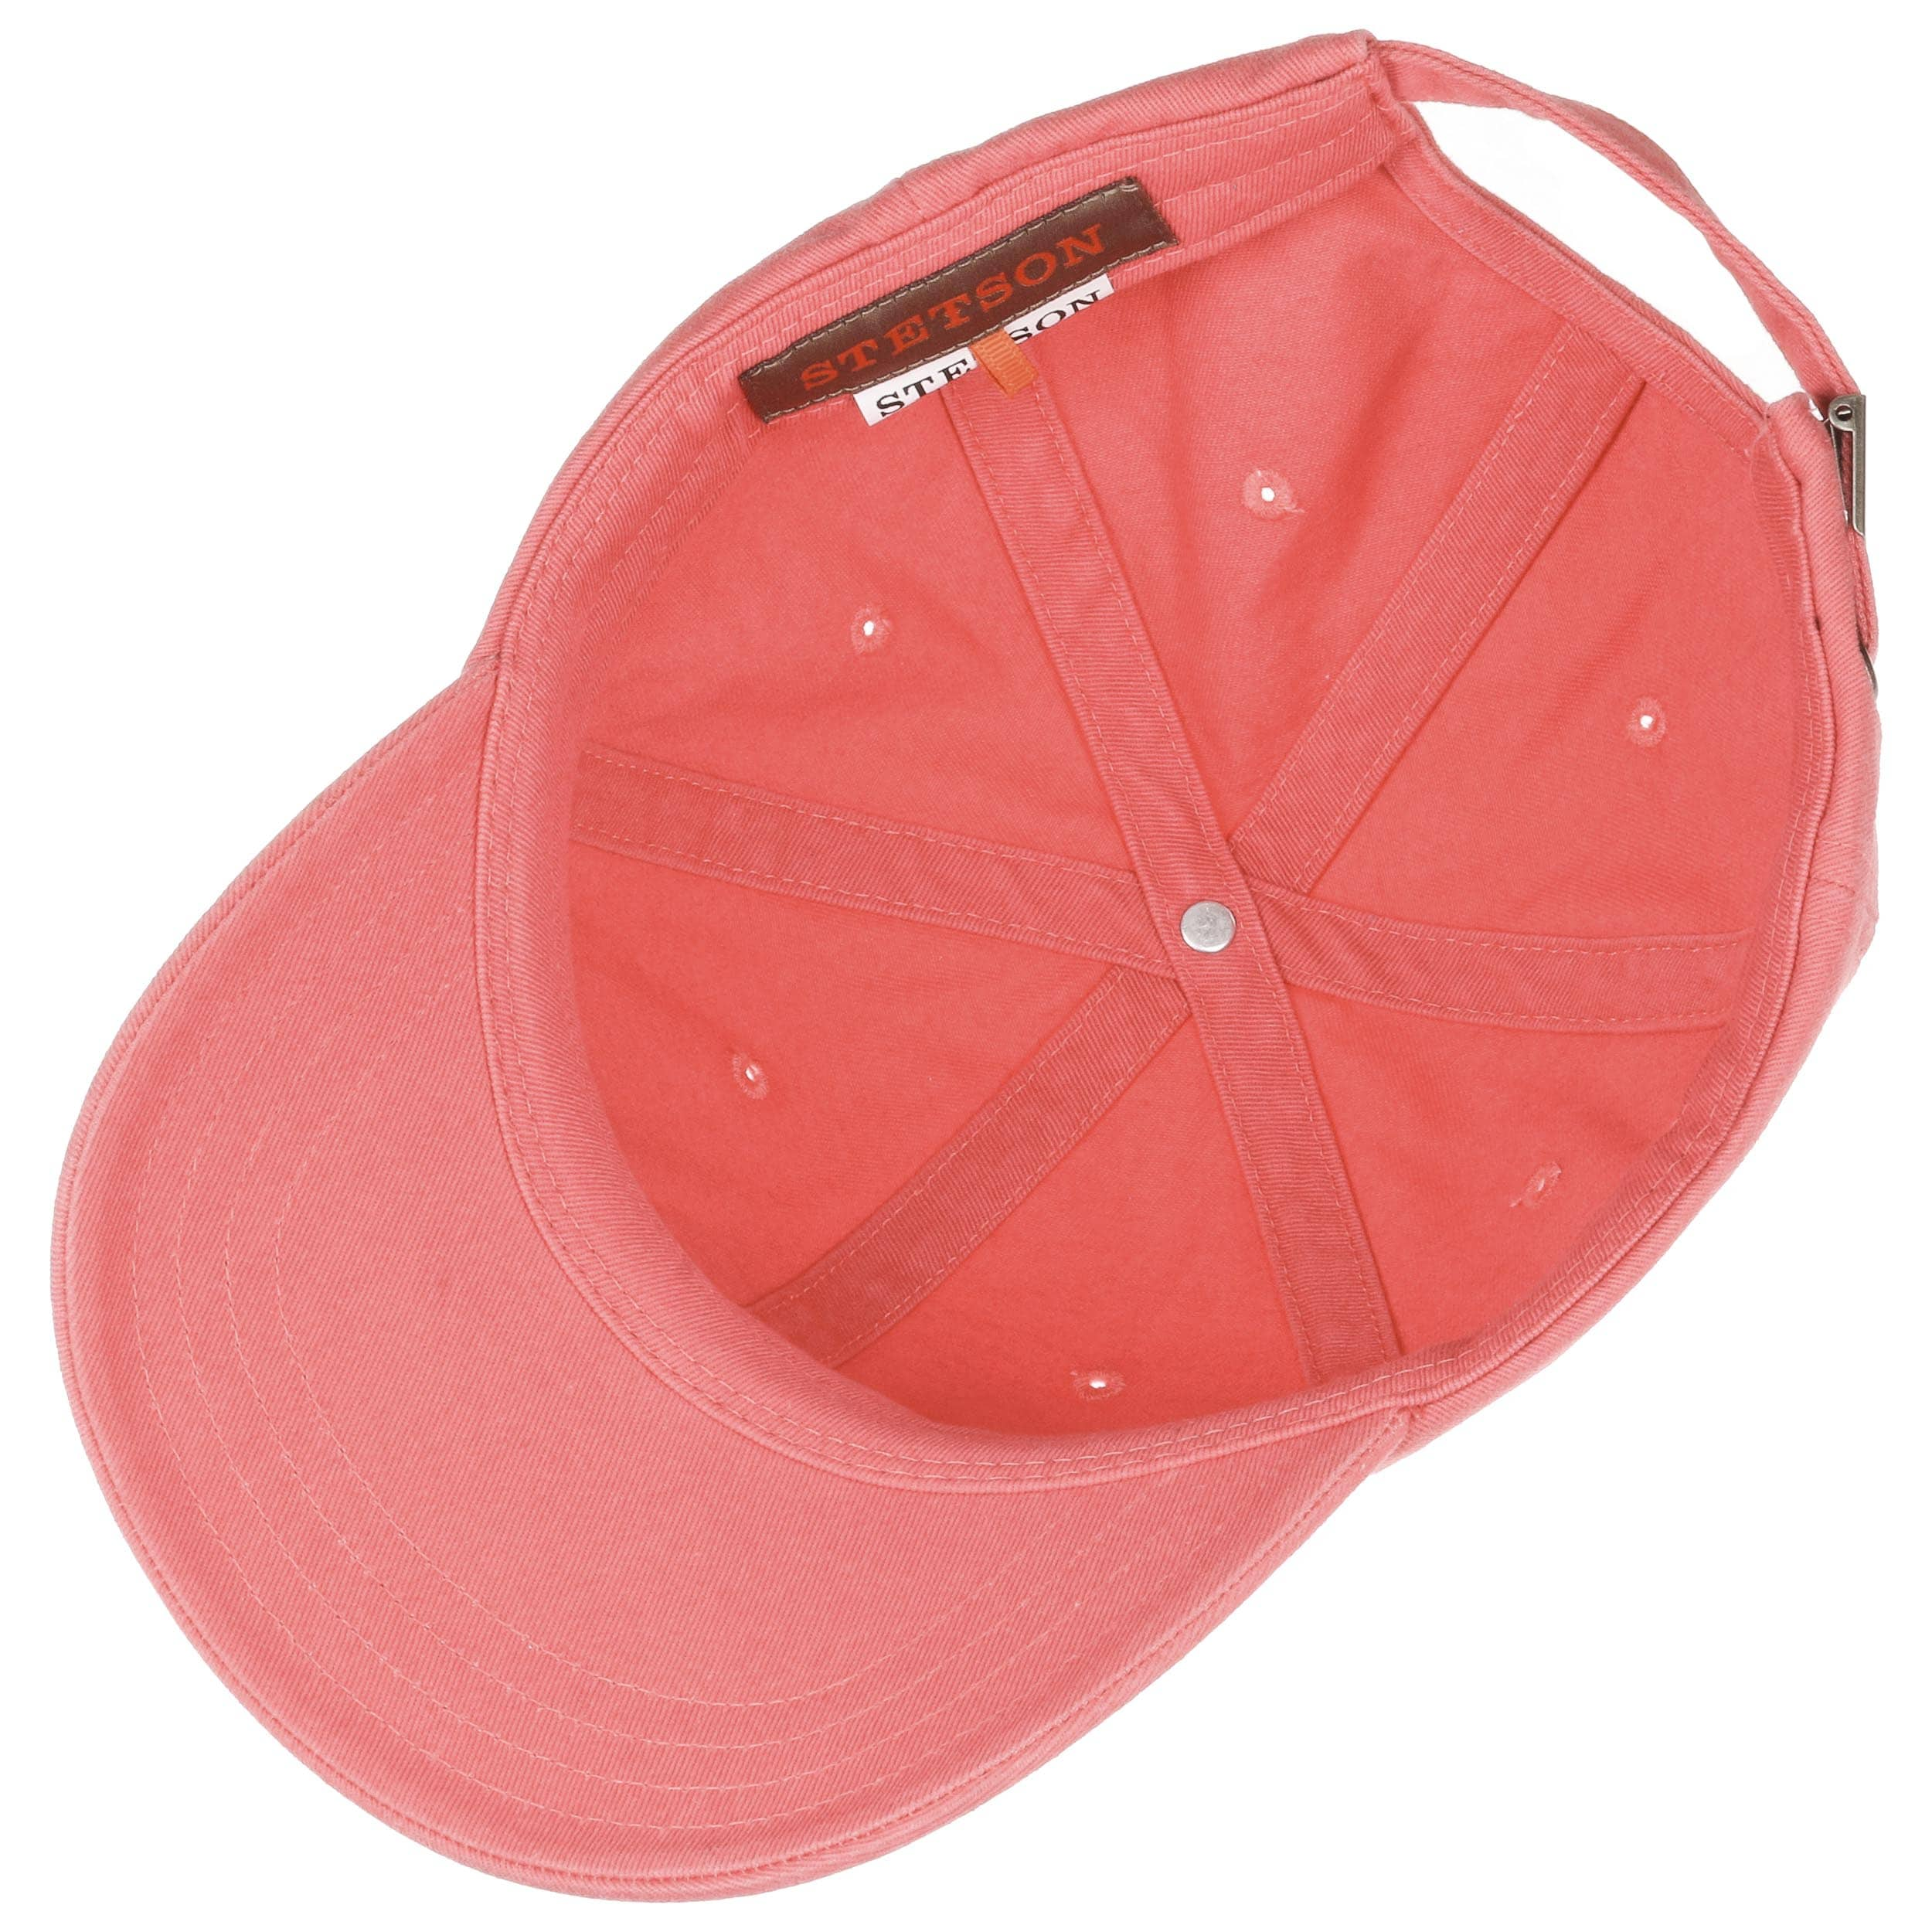 ... Rector Baseball Cap by Stetson - coral 2 ... 301b0a84550